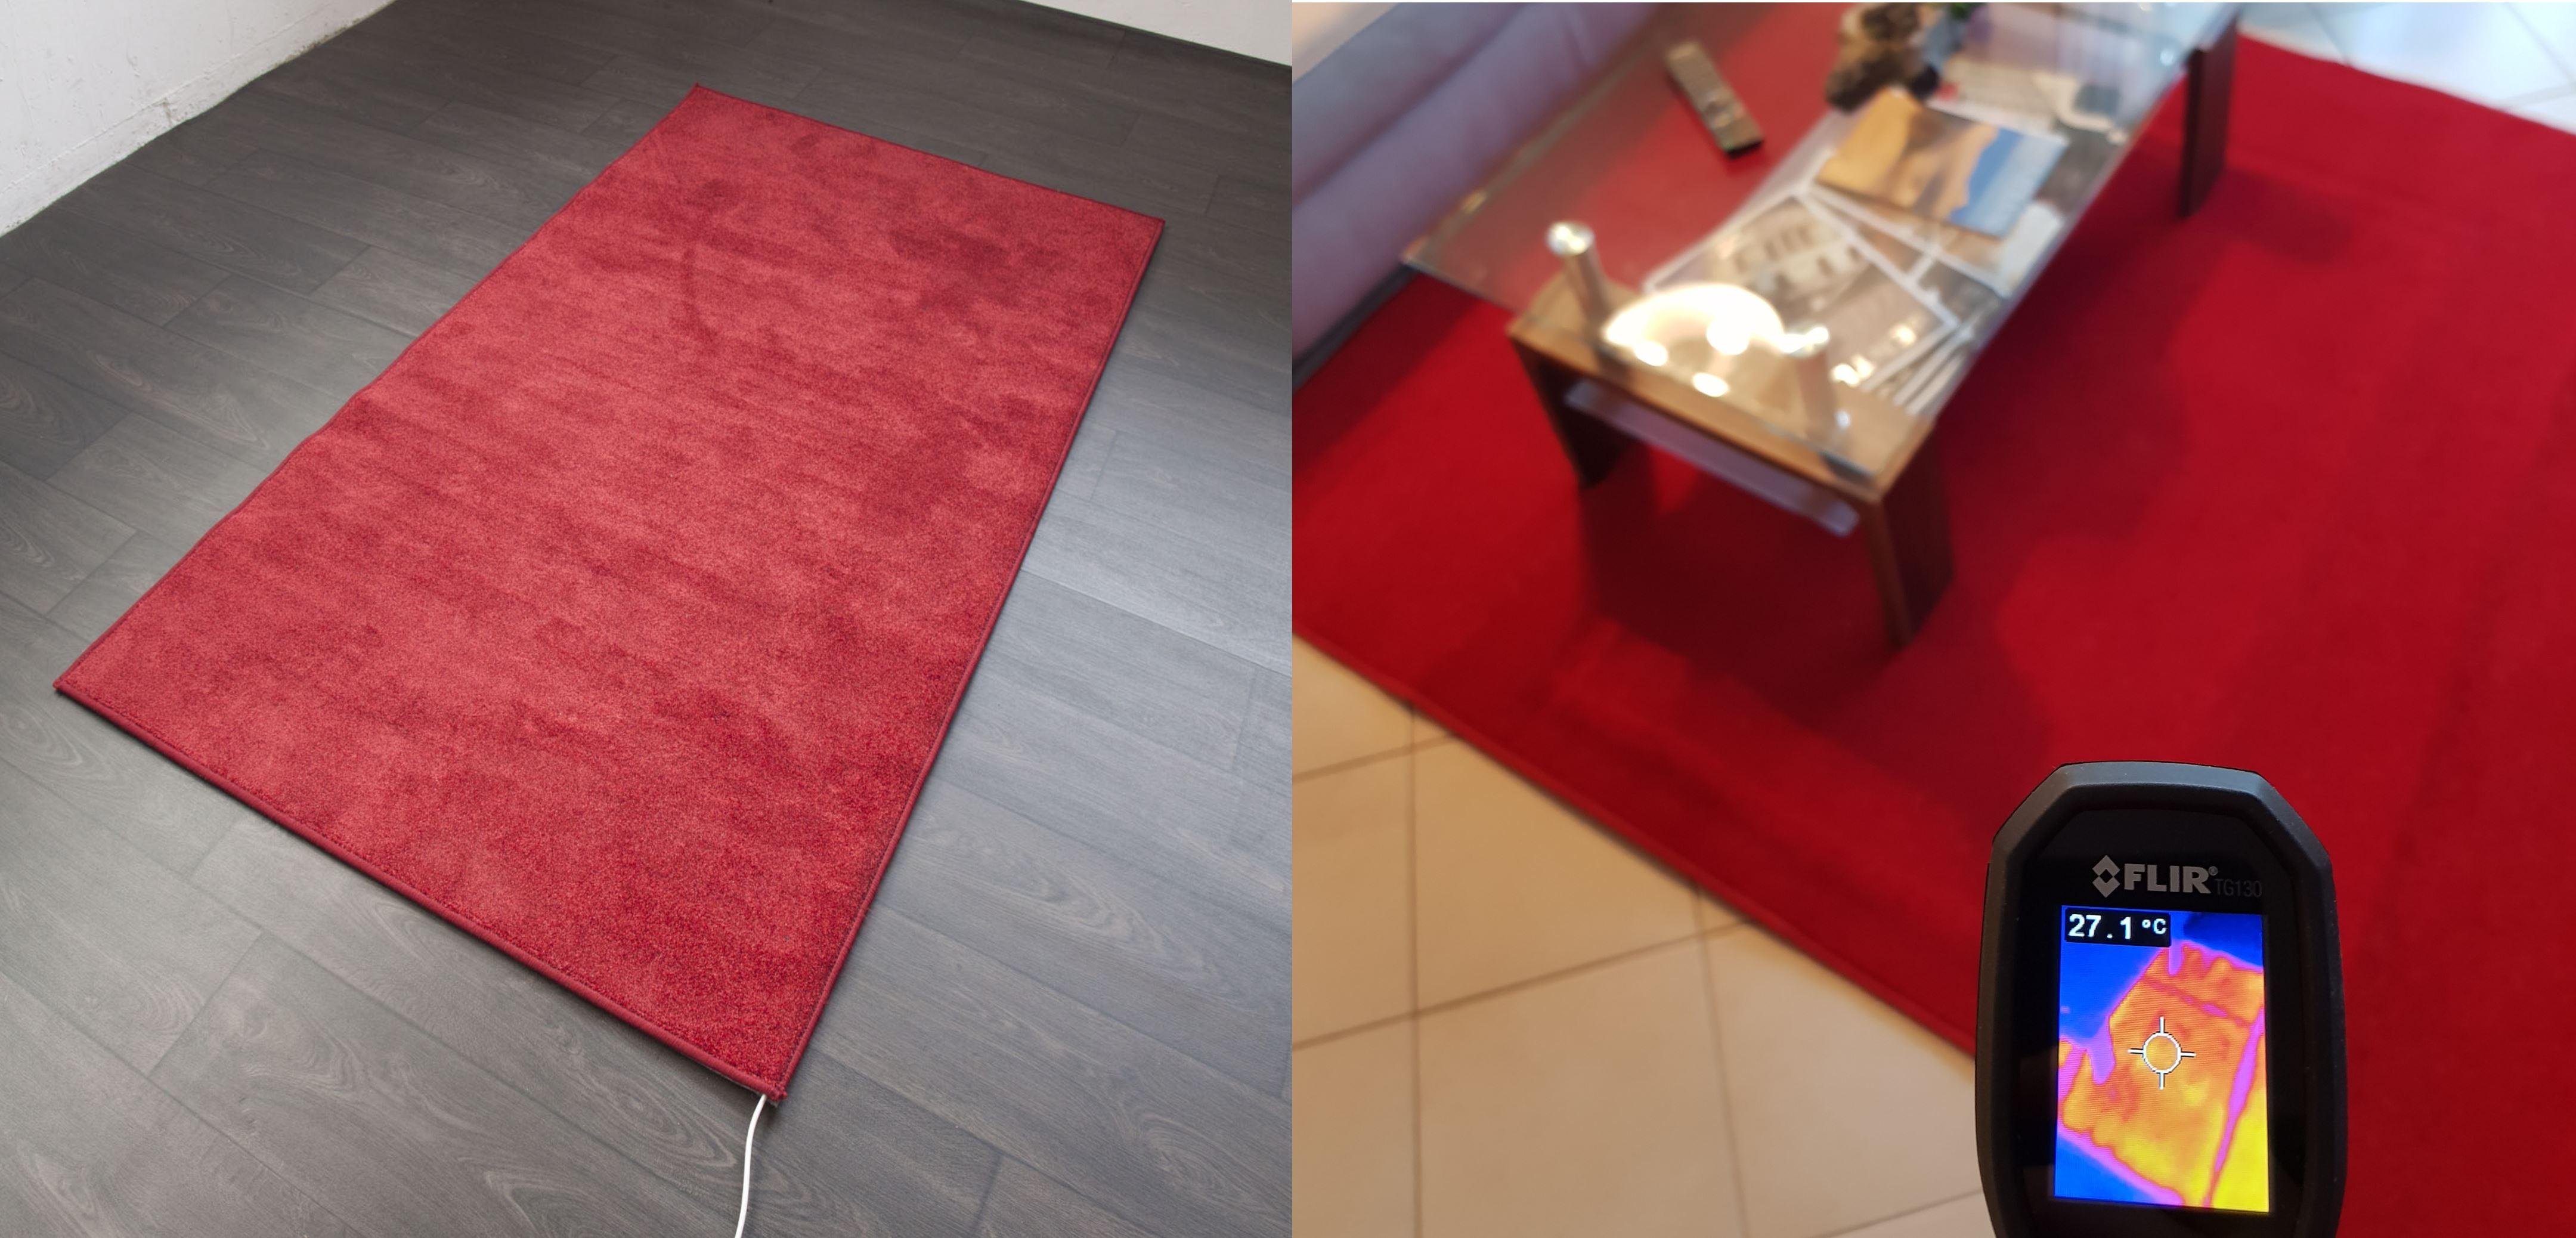 Riscaldamento A Pavimento E Tappeti syrma riscaldamento - tappeti termici riscaldanti elettrici